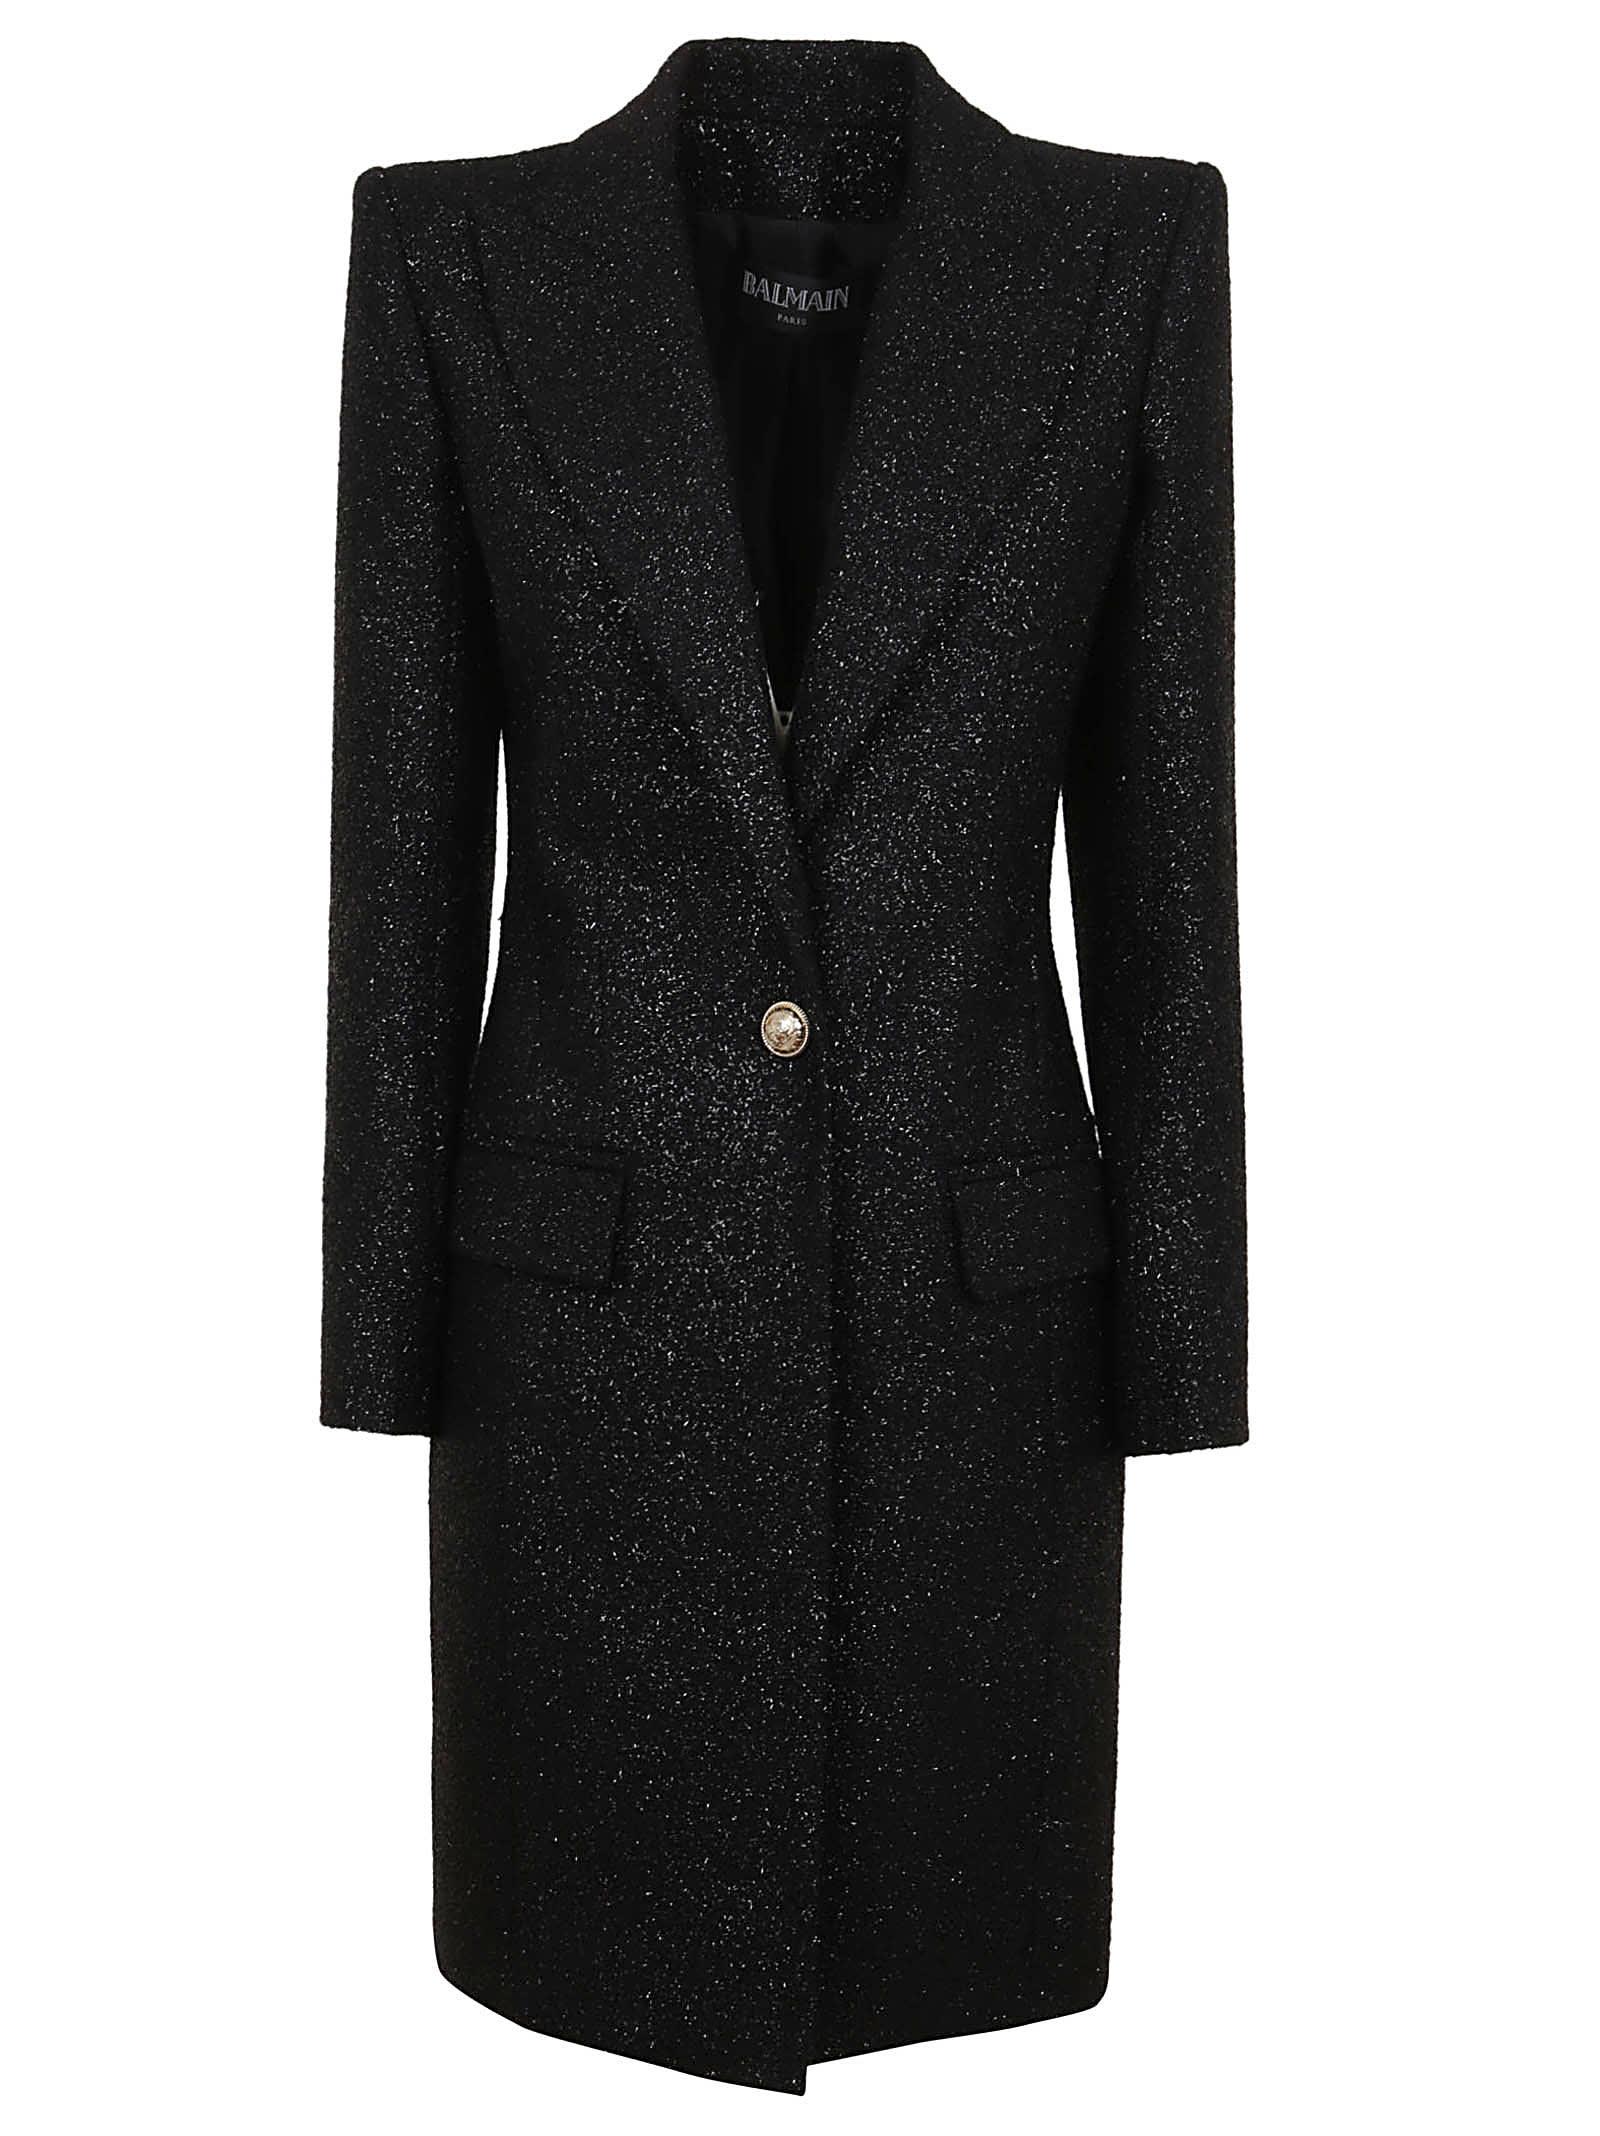 Balmain One Button Tweed Coat